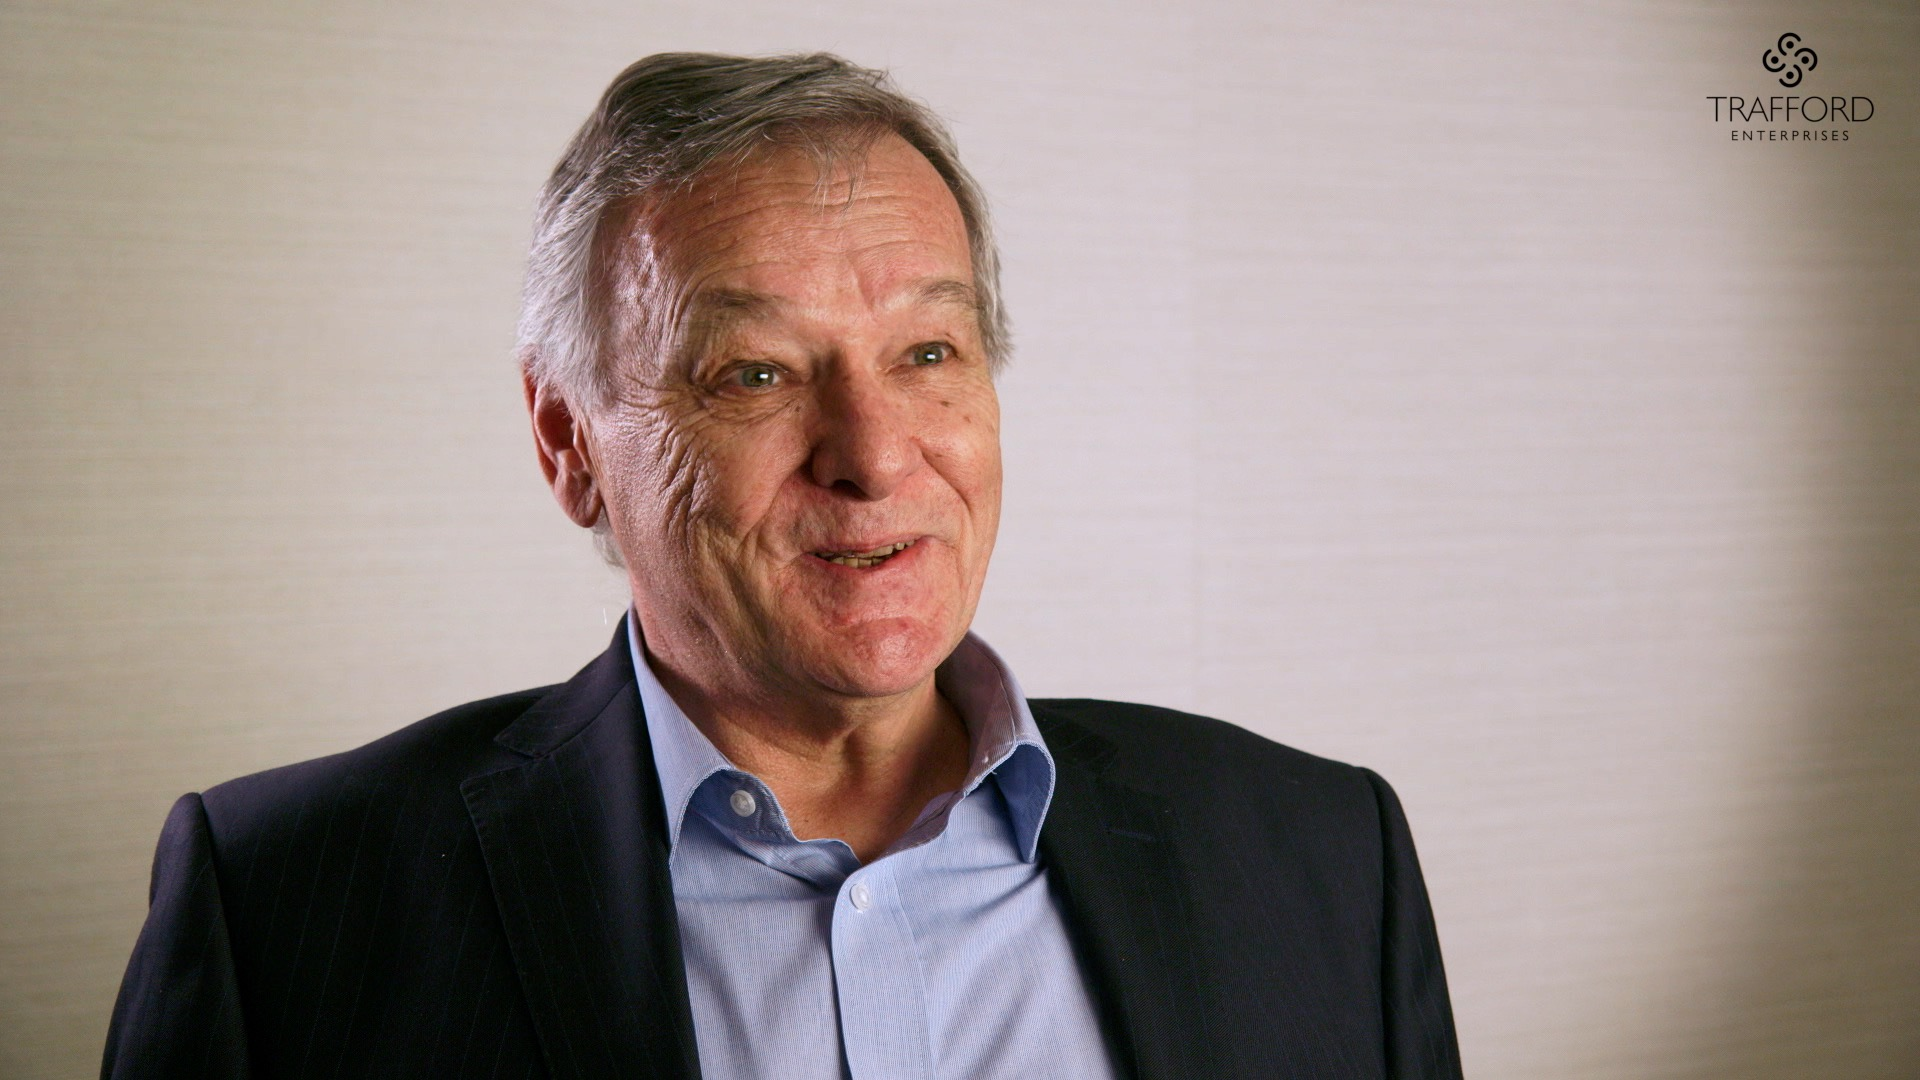 Trafford enterprises - Testimonial Video